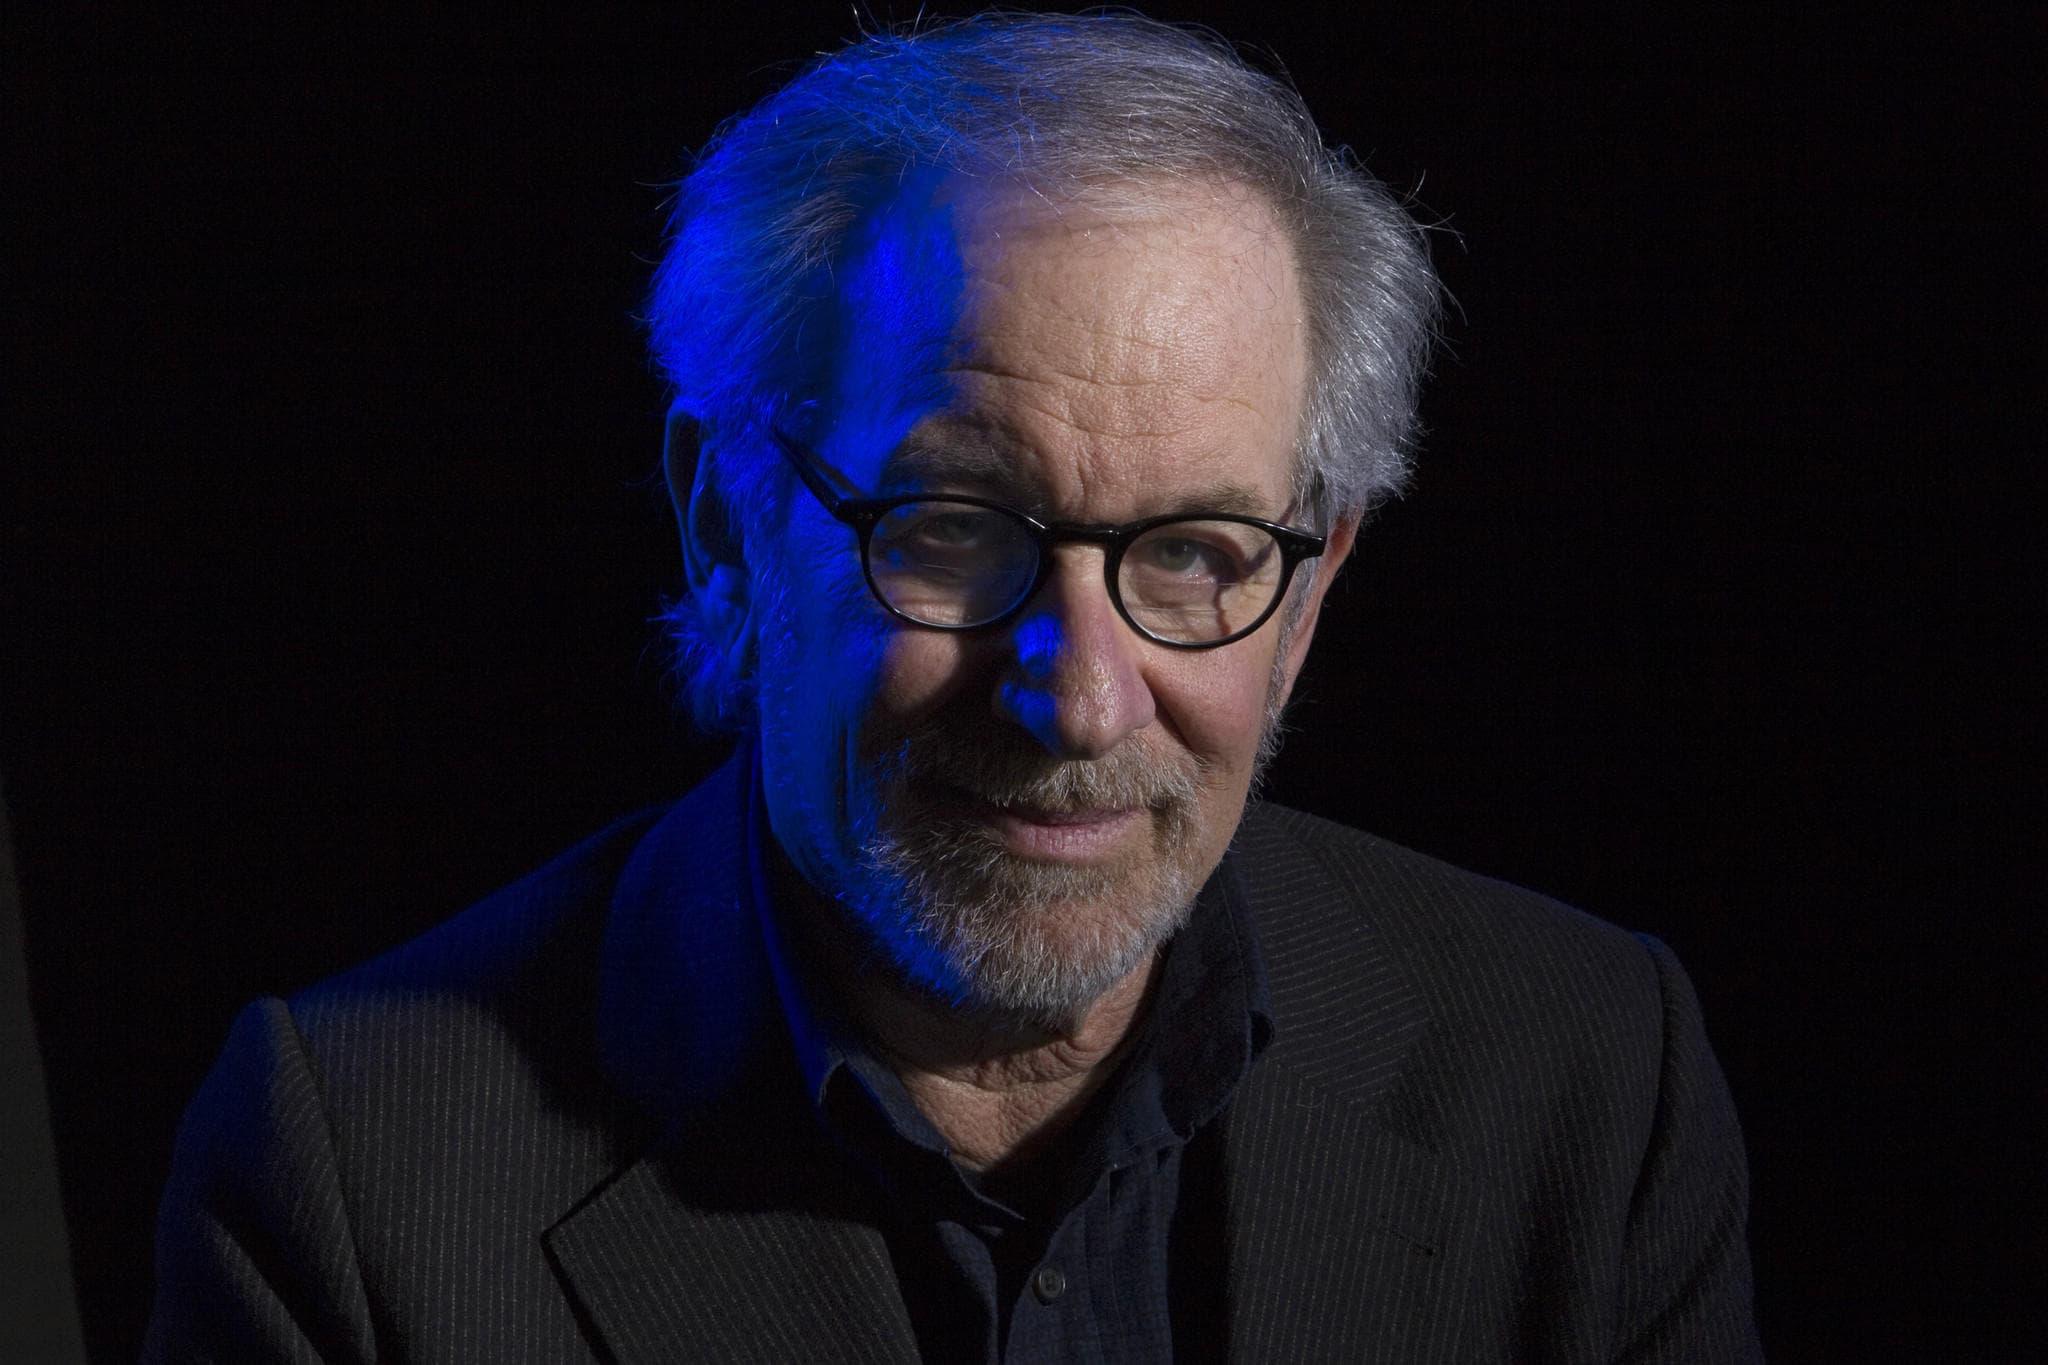 Steven Spielberg Widescreen